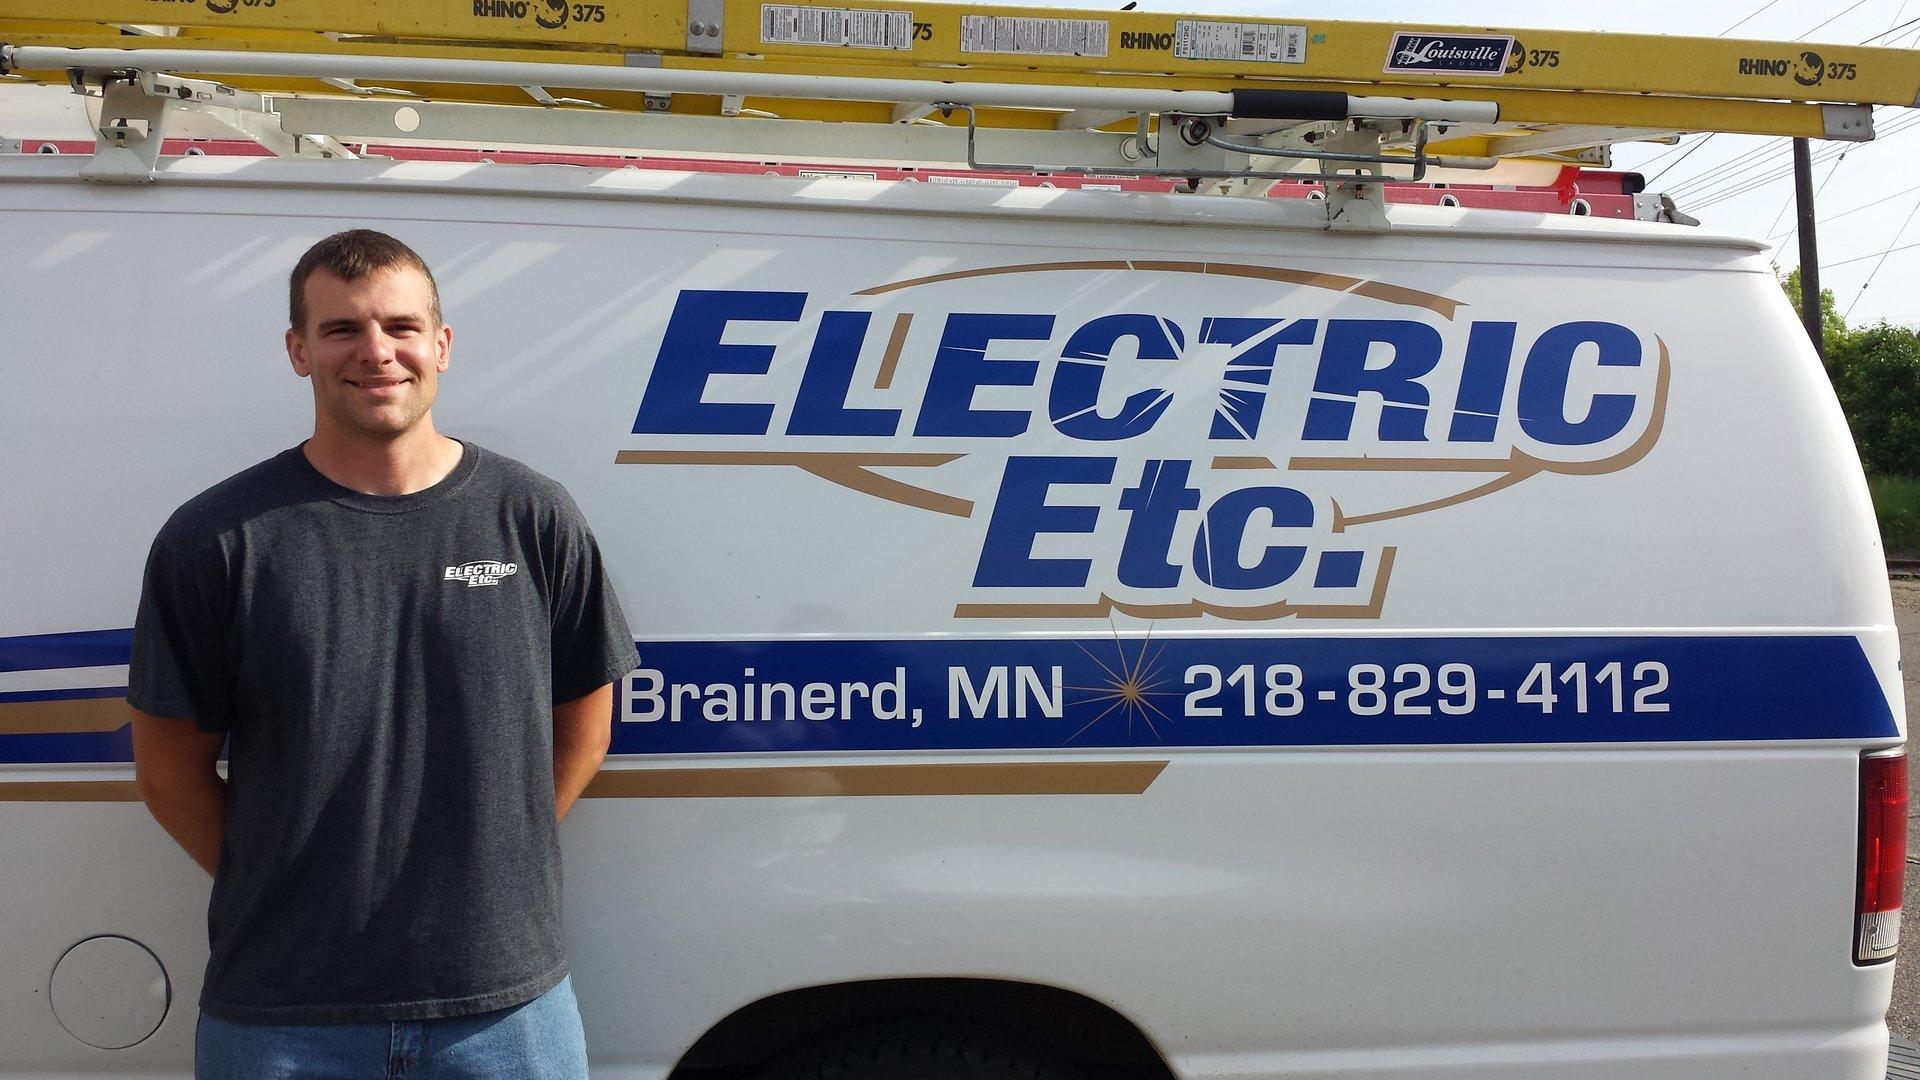 Electric Etc